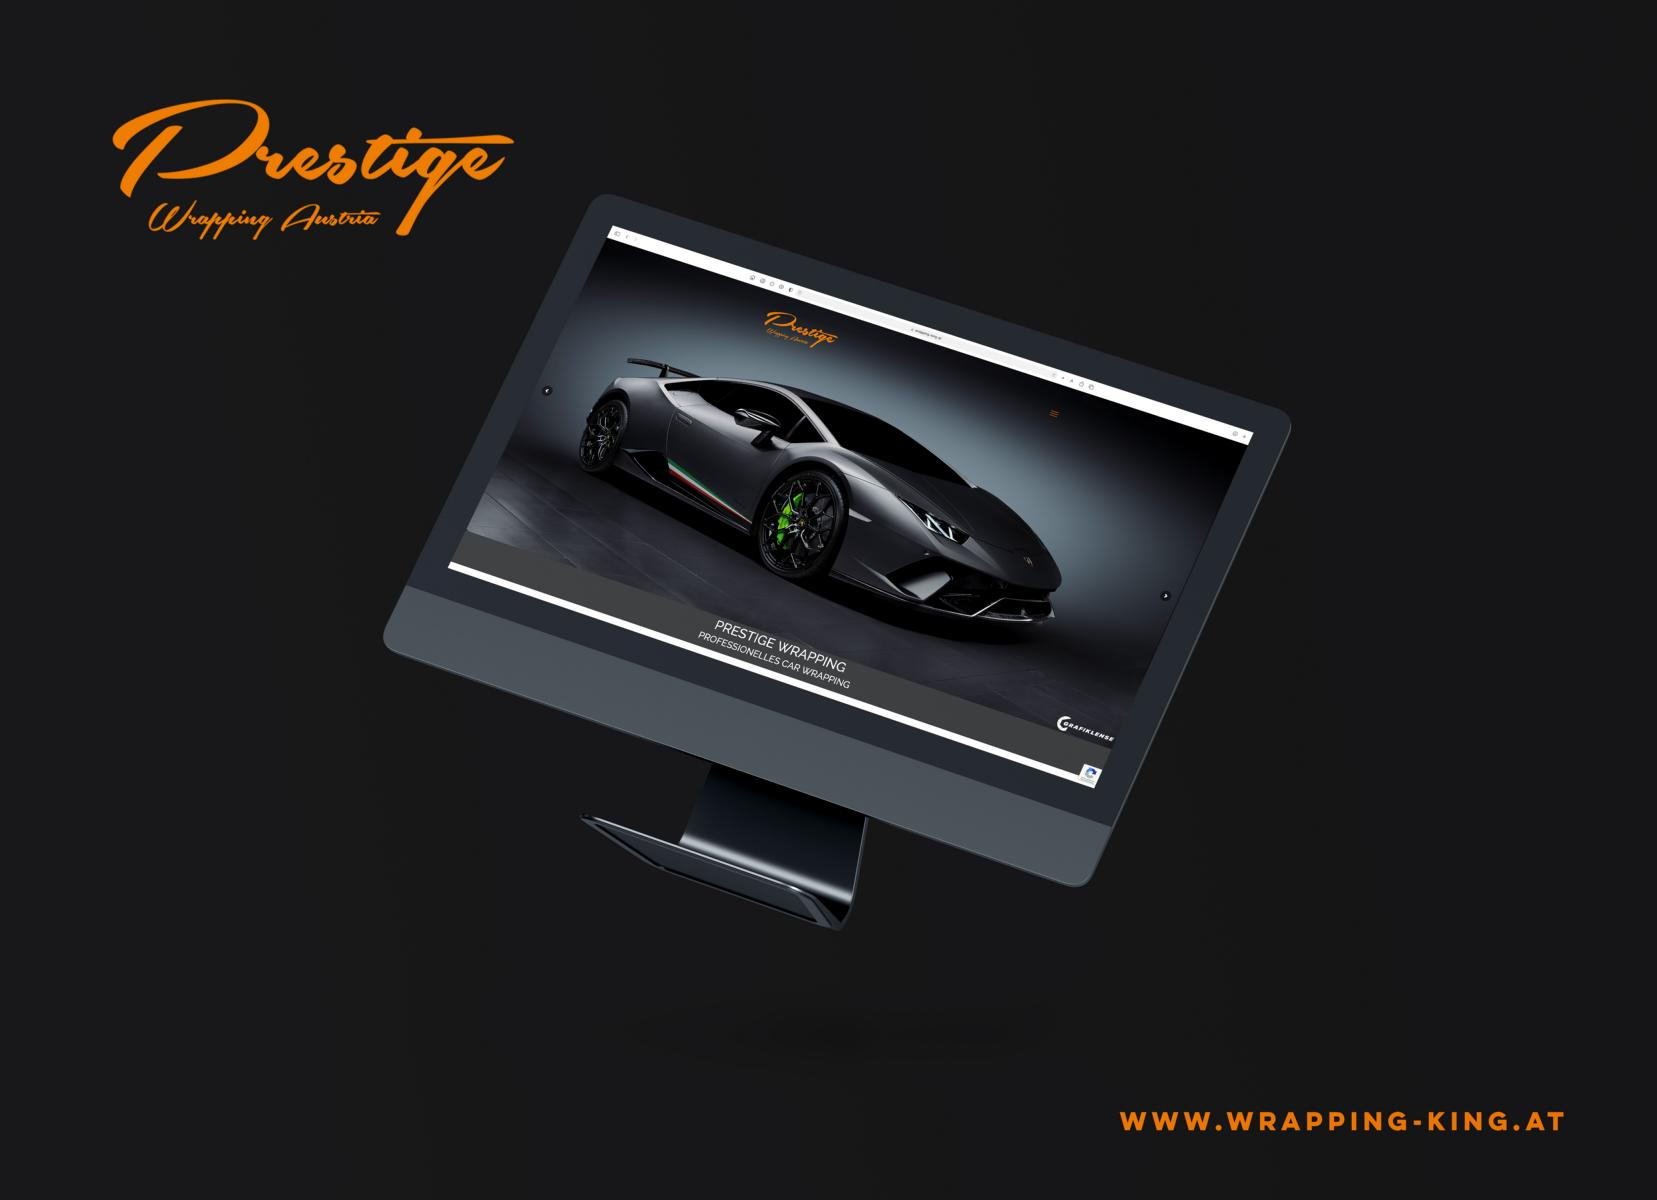 K1600_PrestigeWrapping_Web_Mockup